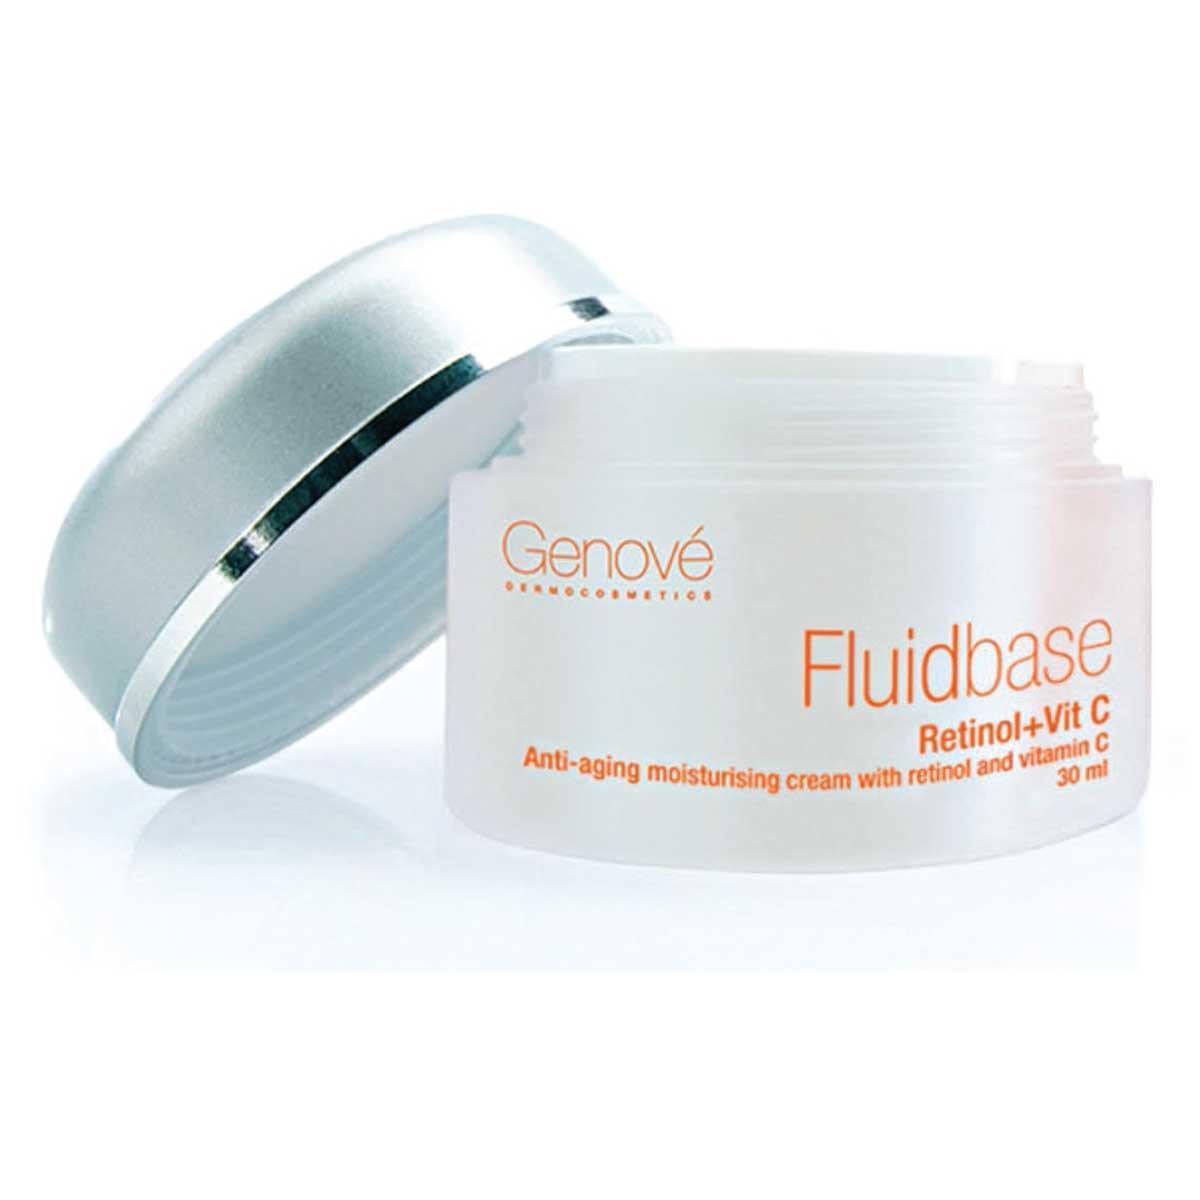 Fluidbase Retinol + Vitamina C 30 Ml